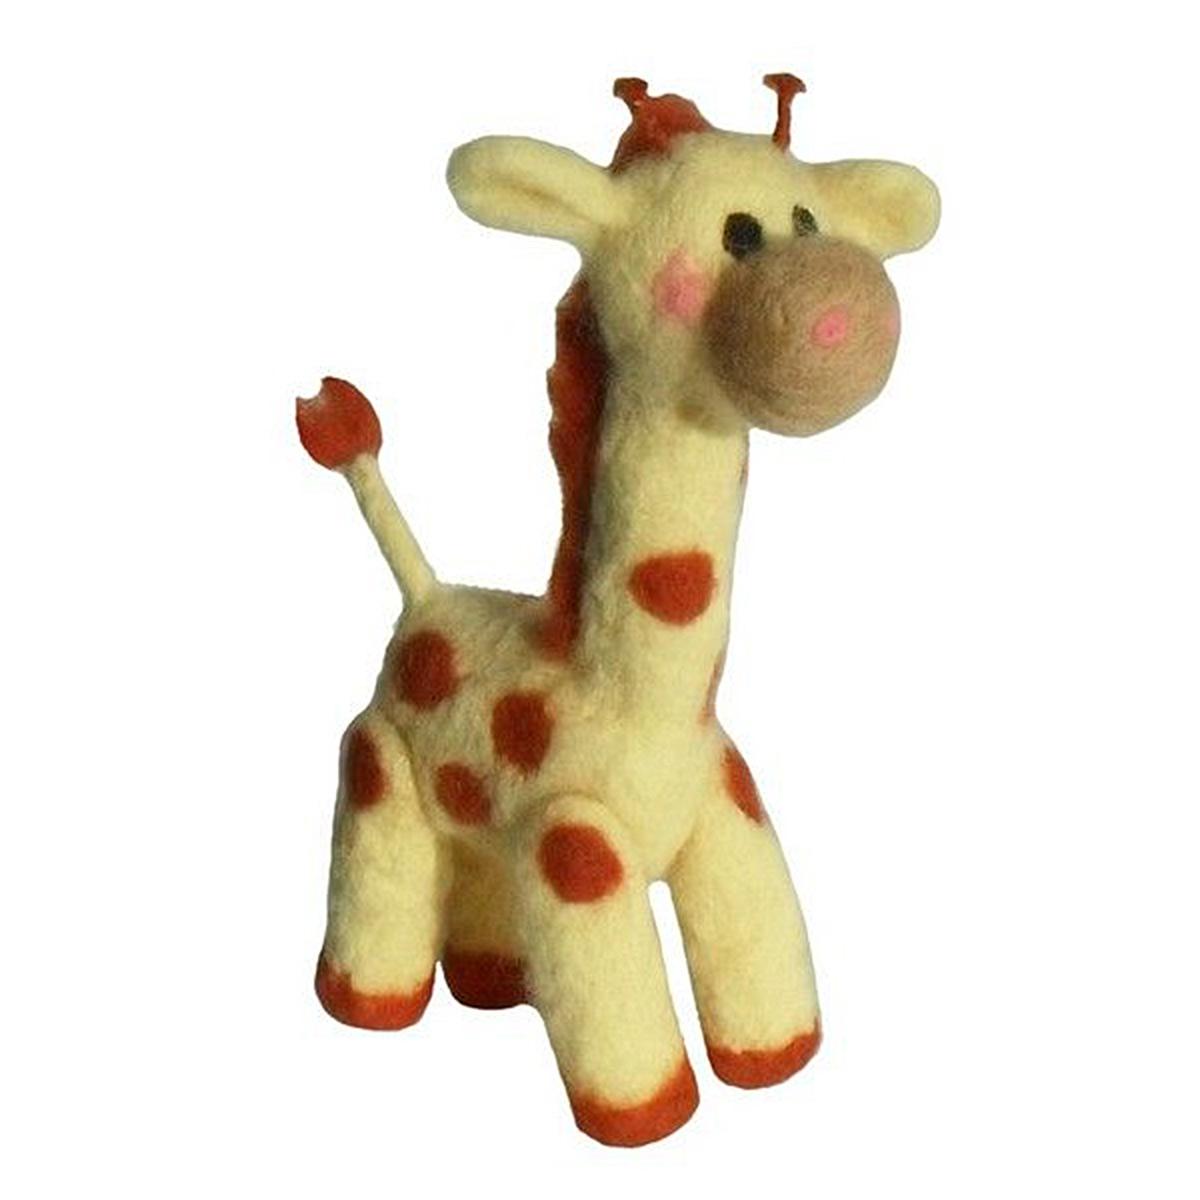 ВЛ-014 Набор для валяния 'Жираф', 17*5 см, 'Семицветик'